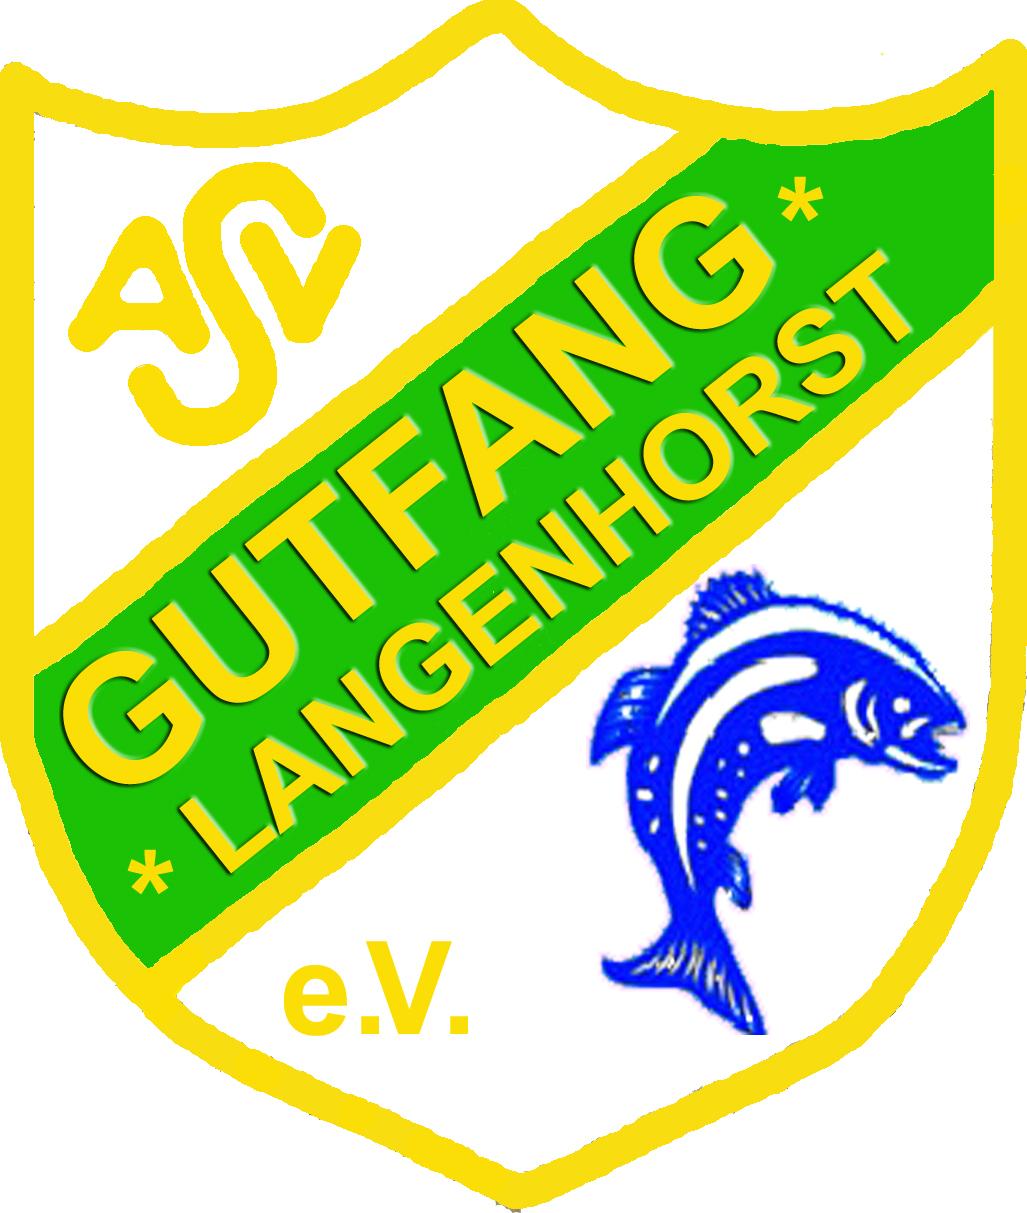 ASV Gut Fang Langenhorst e.V.